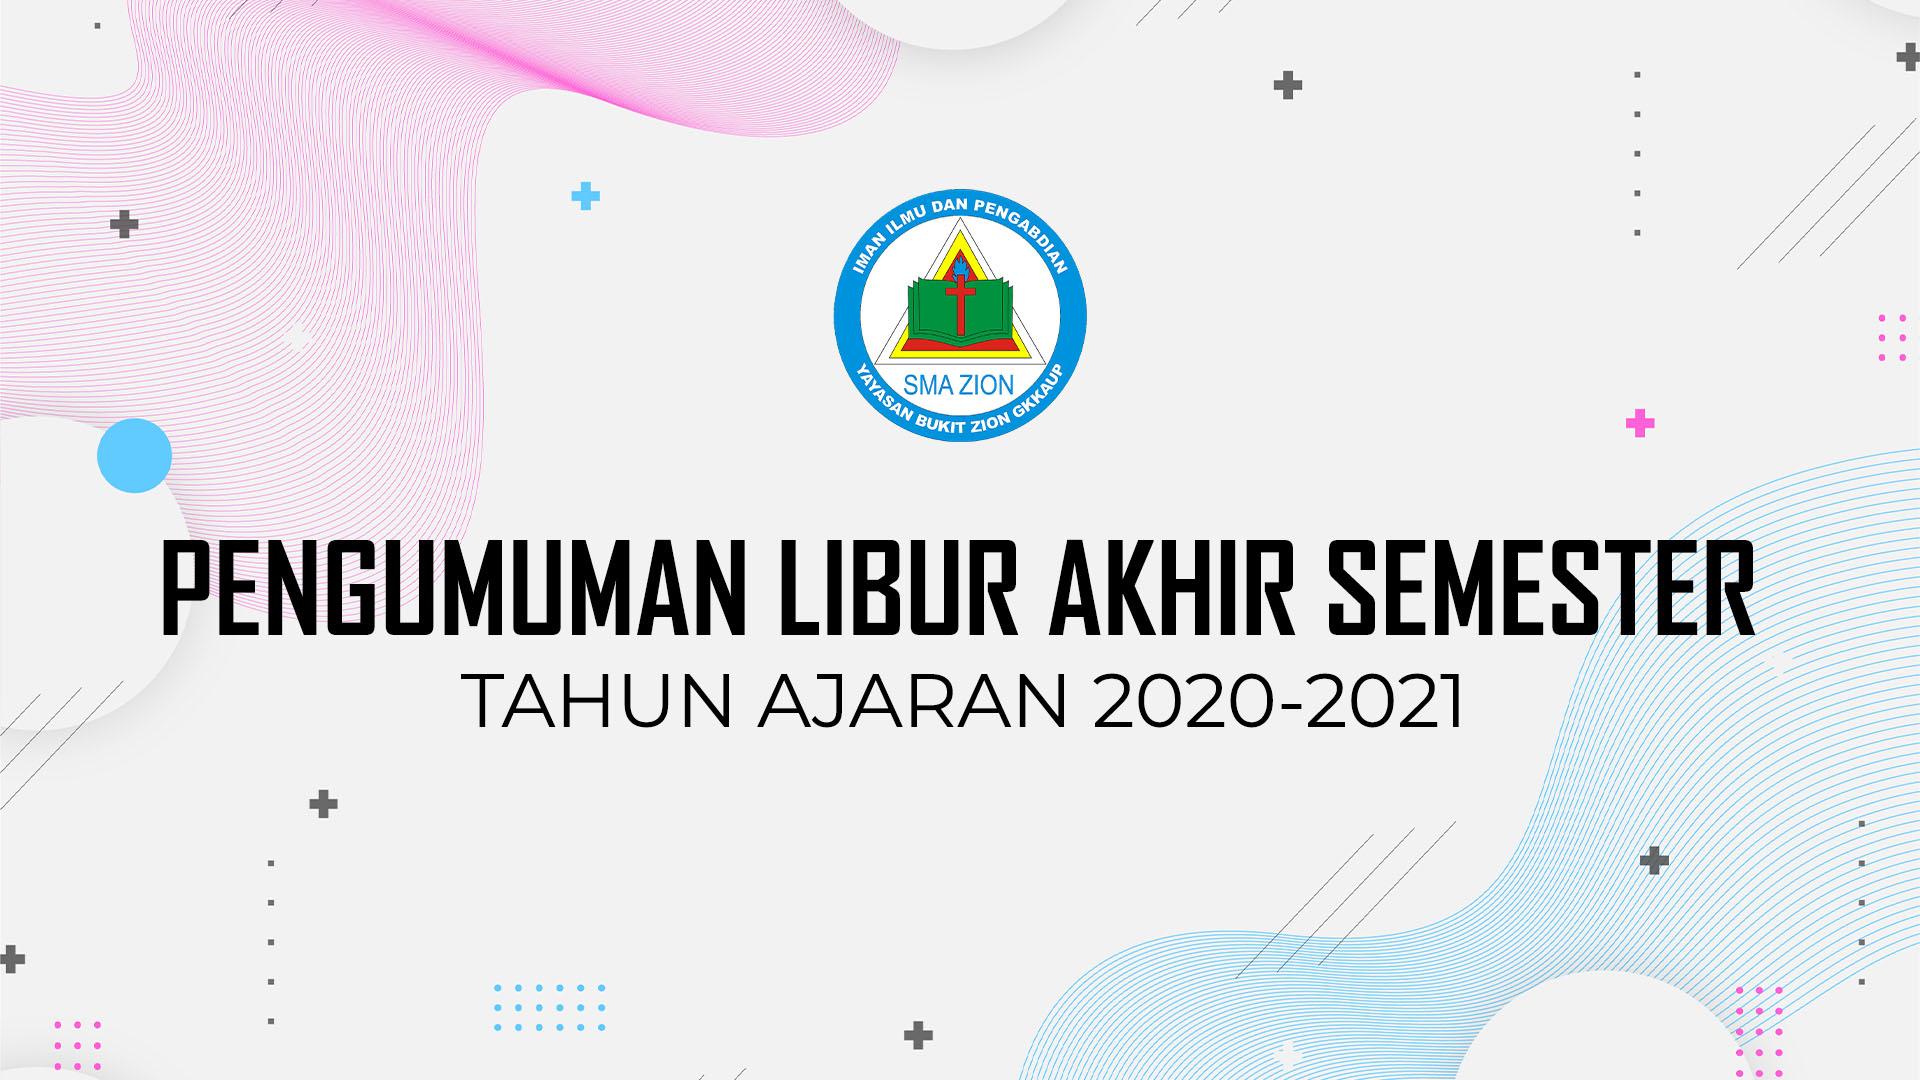 Pengumuman Libur Akhir Semester T. P. 2020-2021